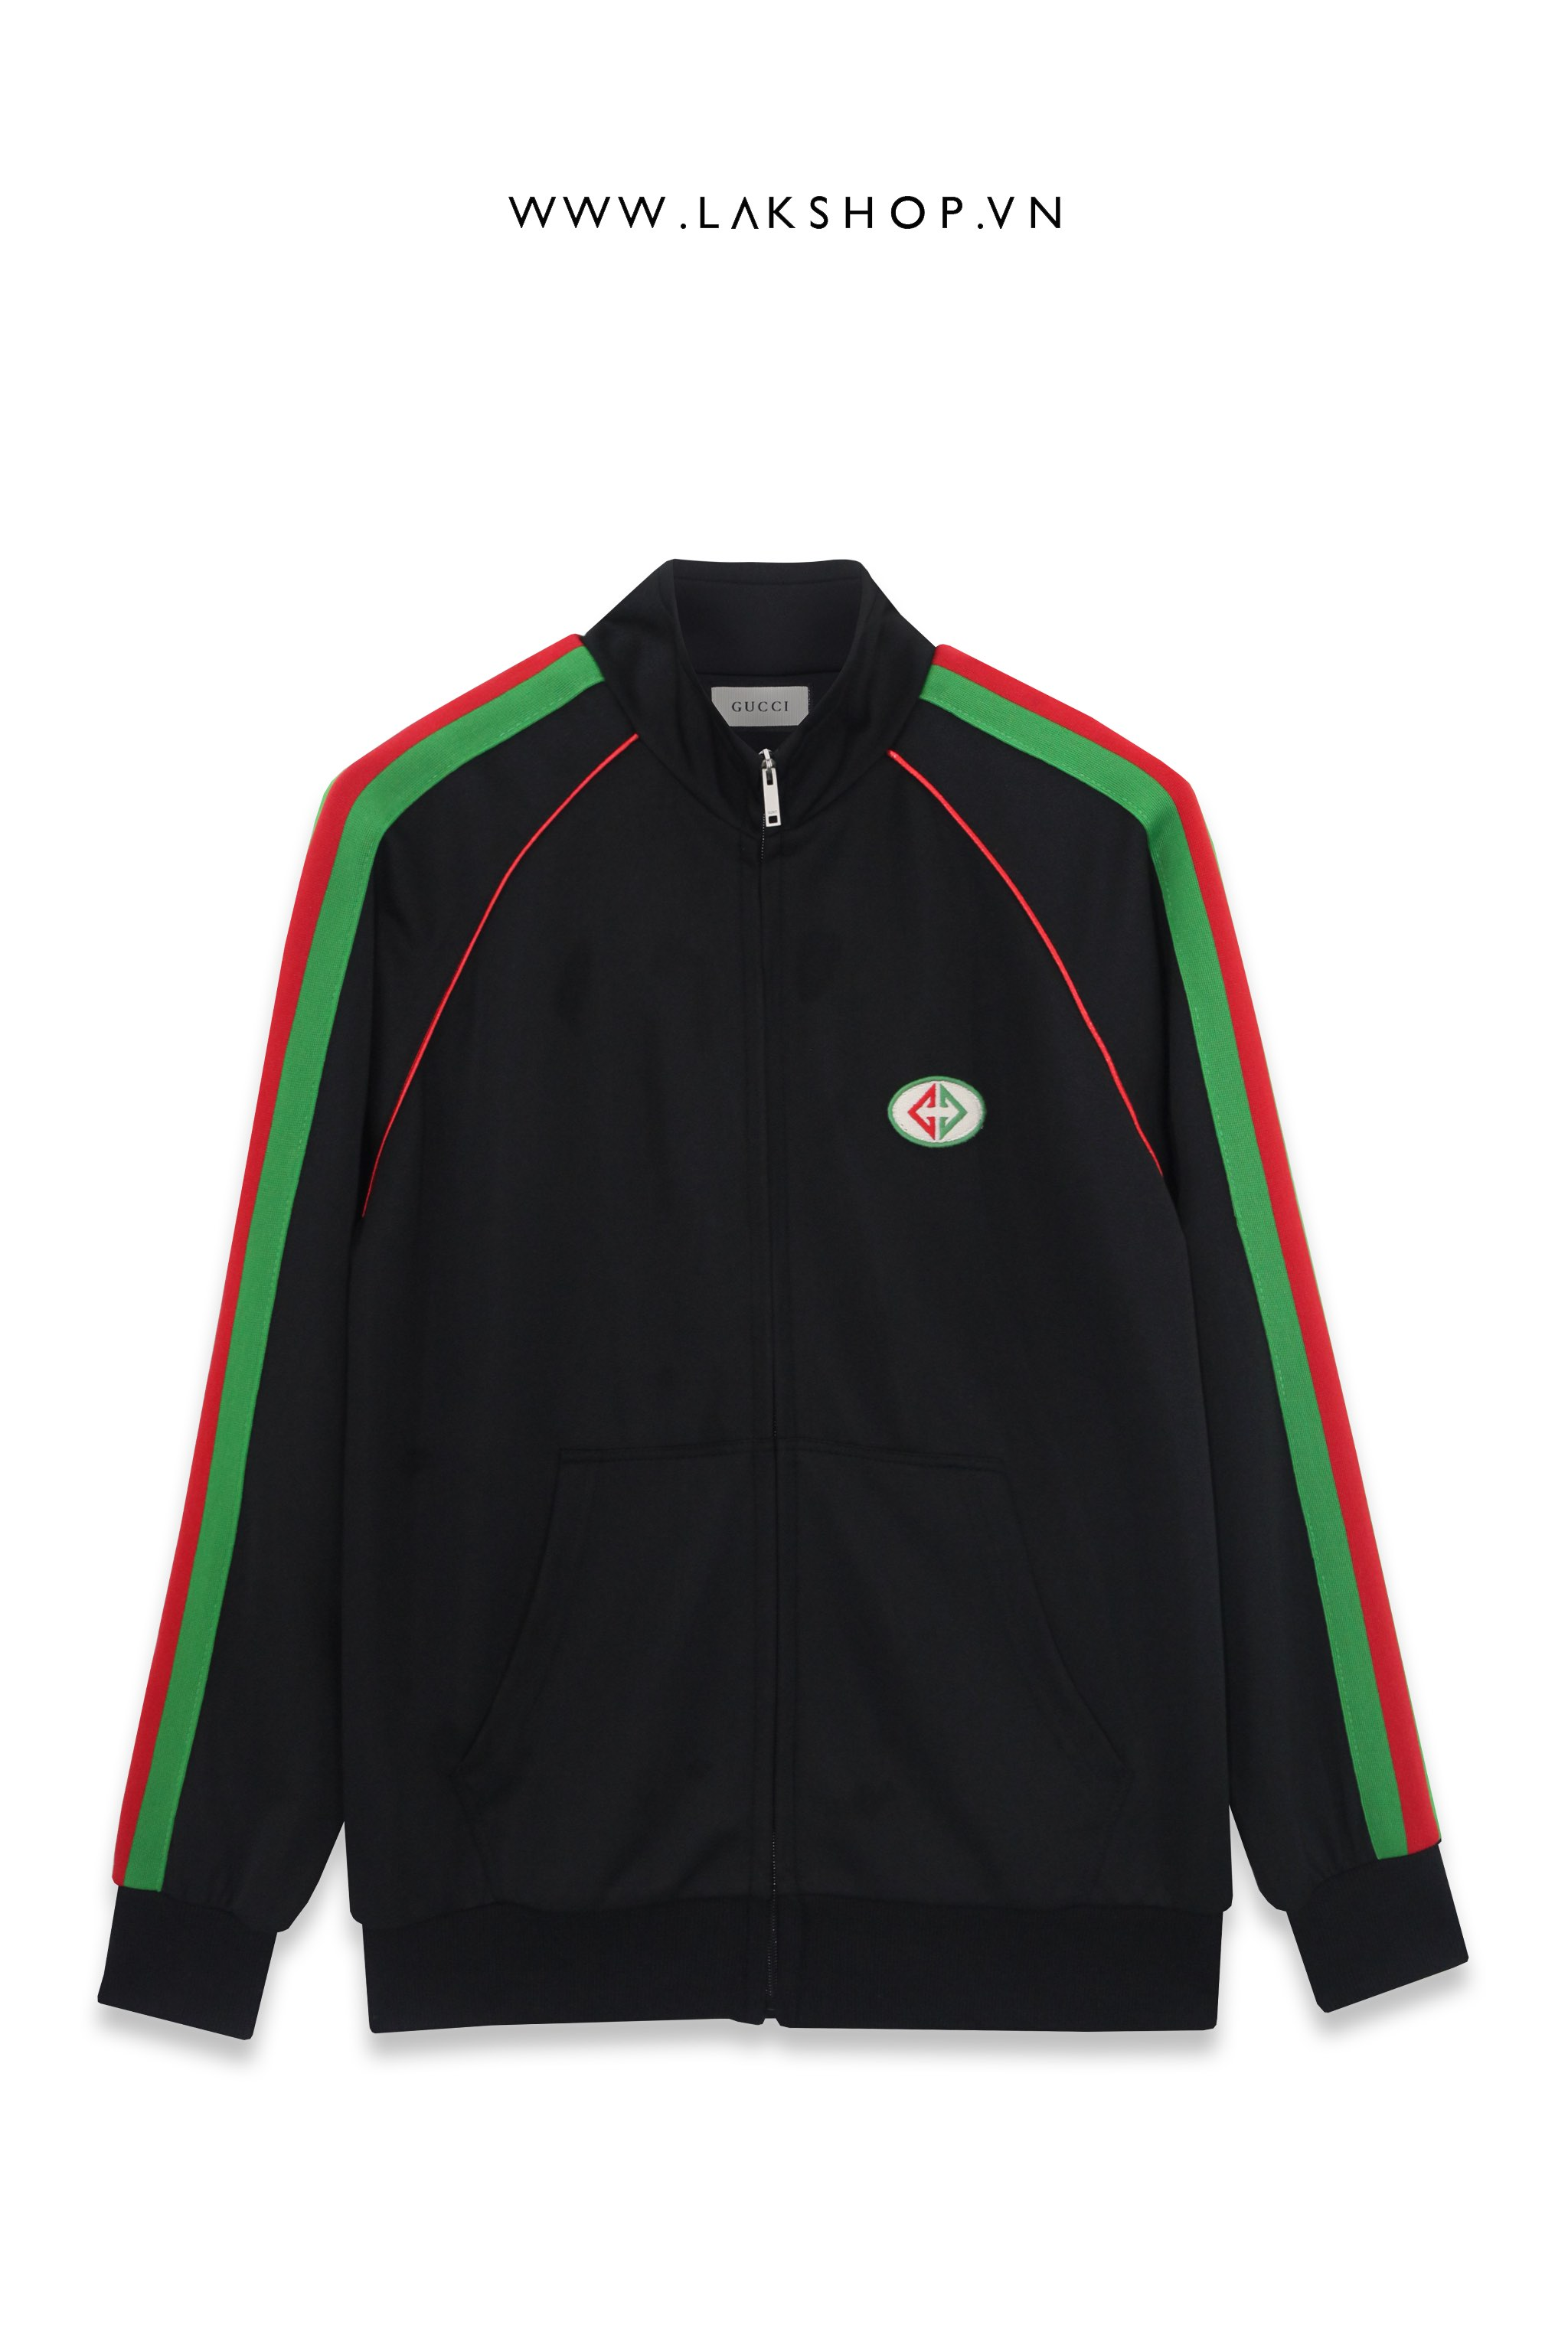 Gucci Black/Green Logo Track Jacket  cv3